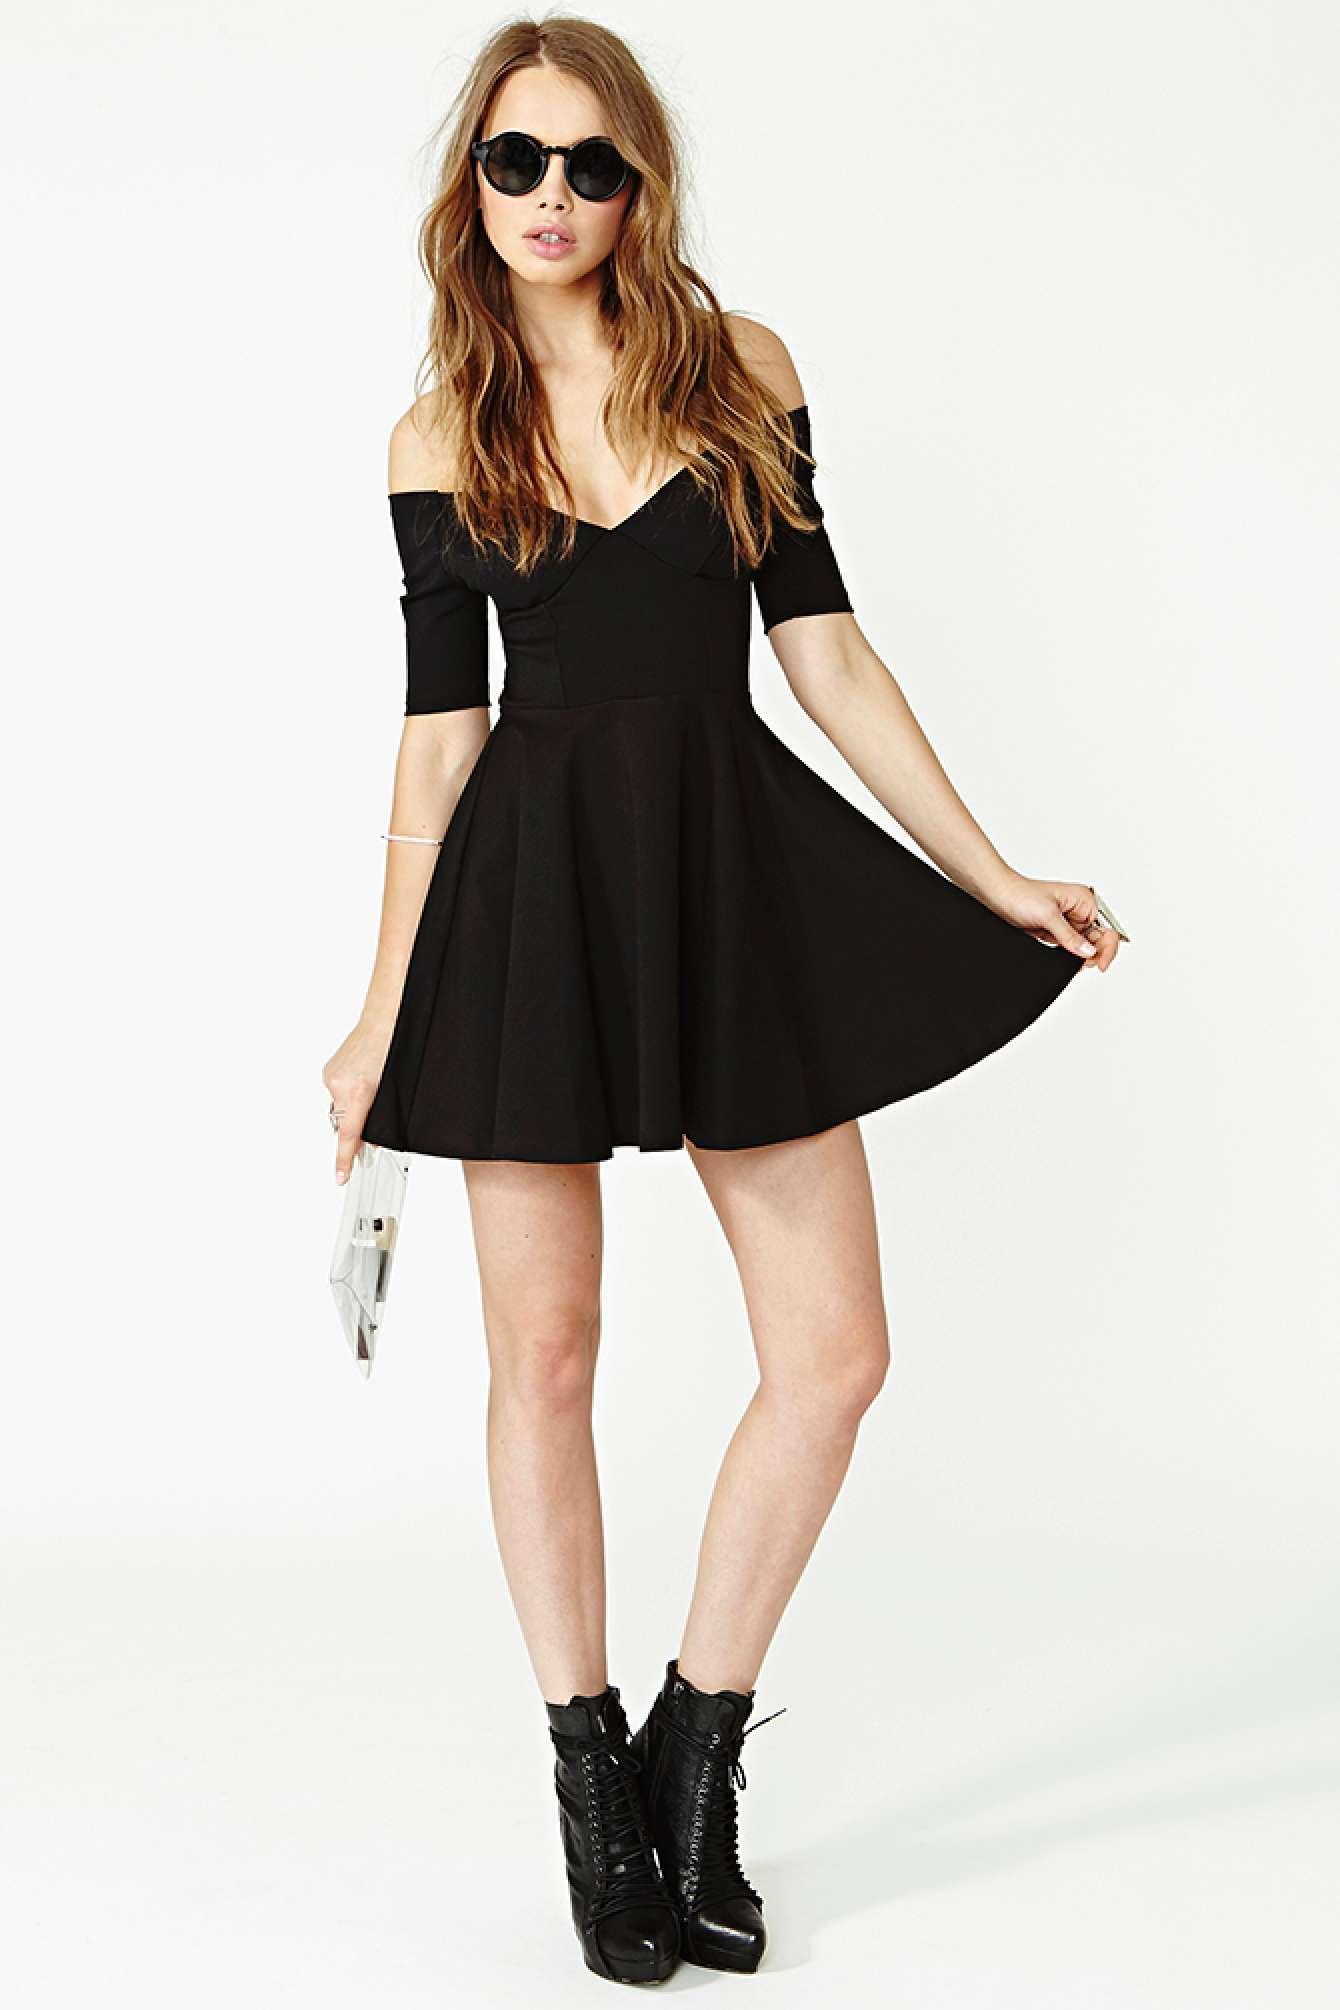 Lyst - Nasty Gal Hot Ticket Skater Dress In Black-9163